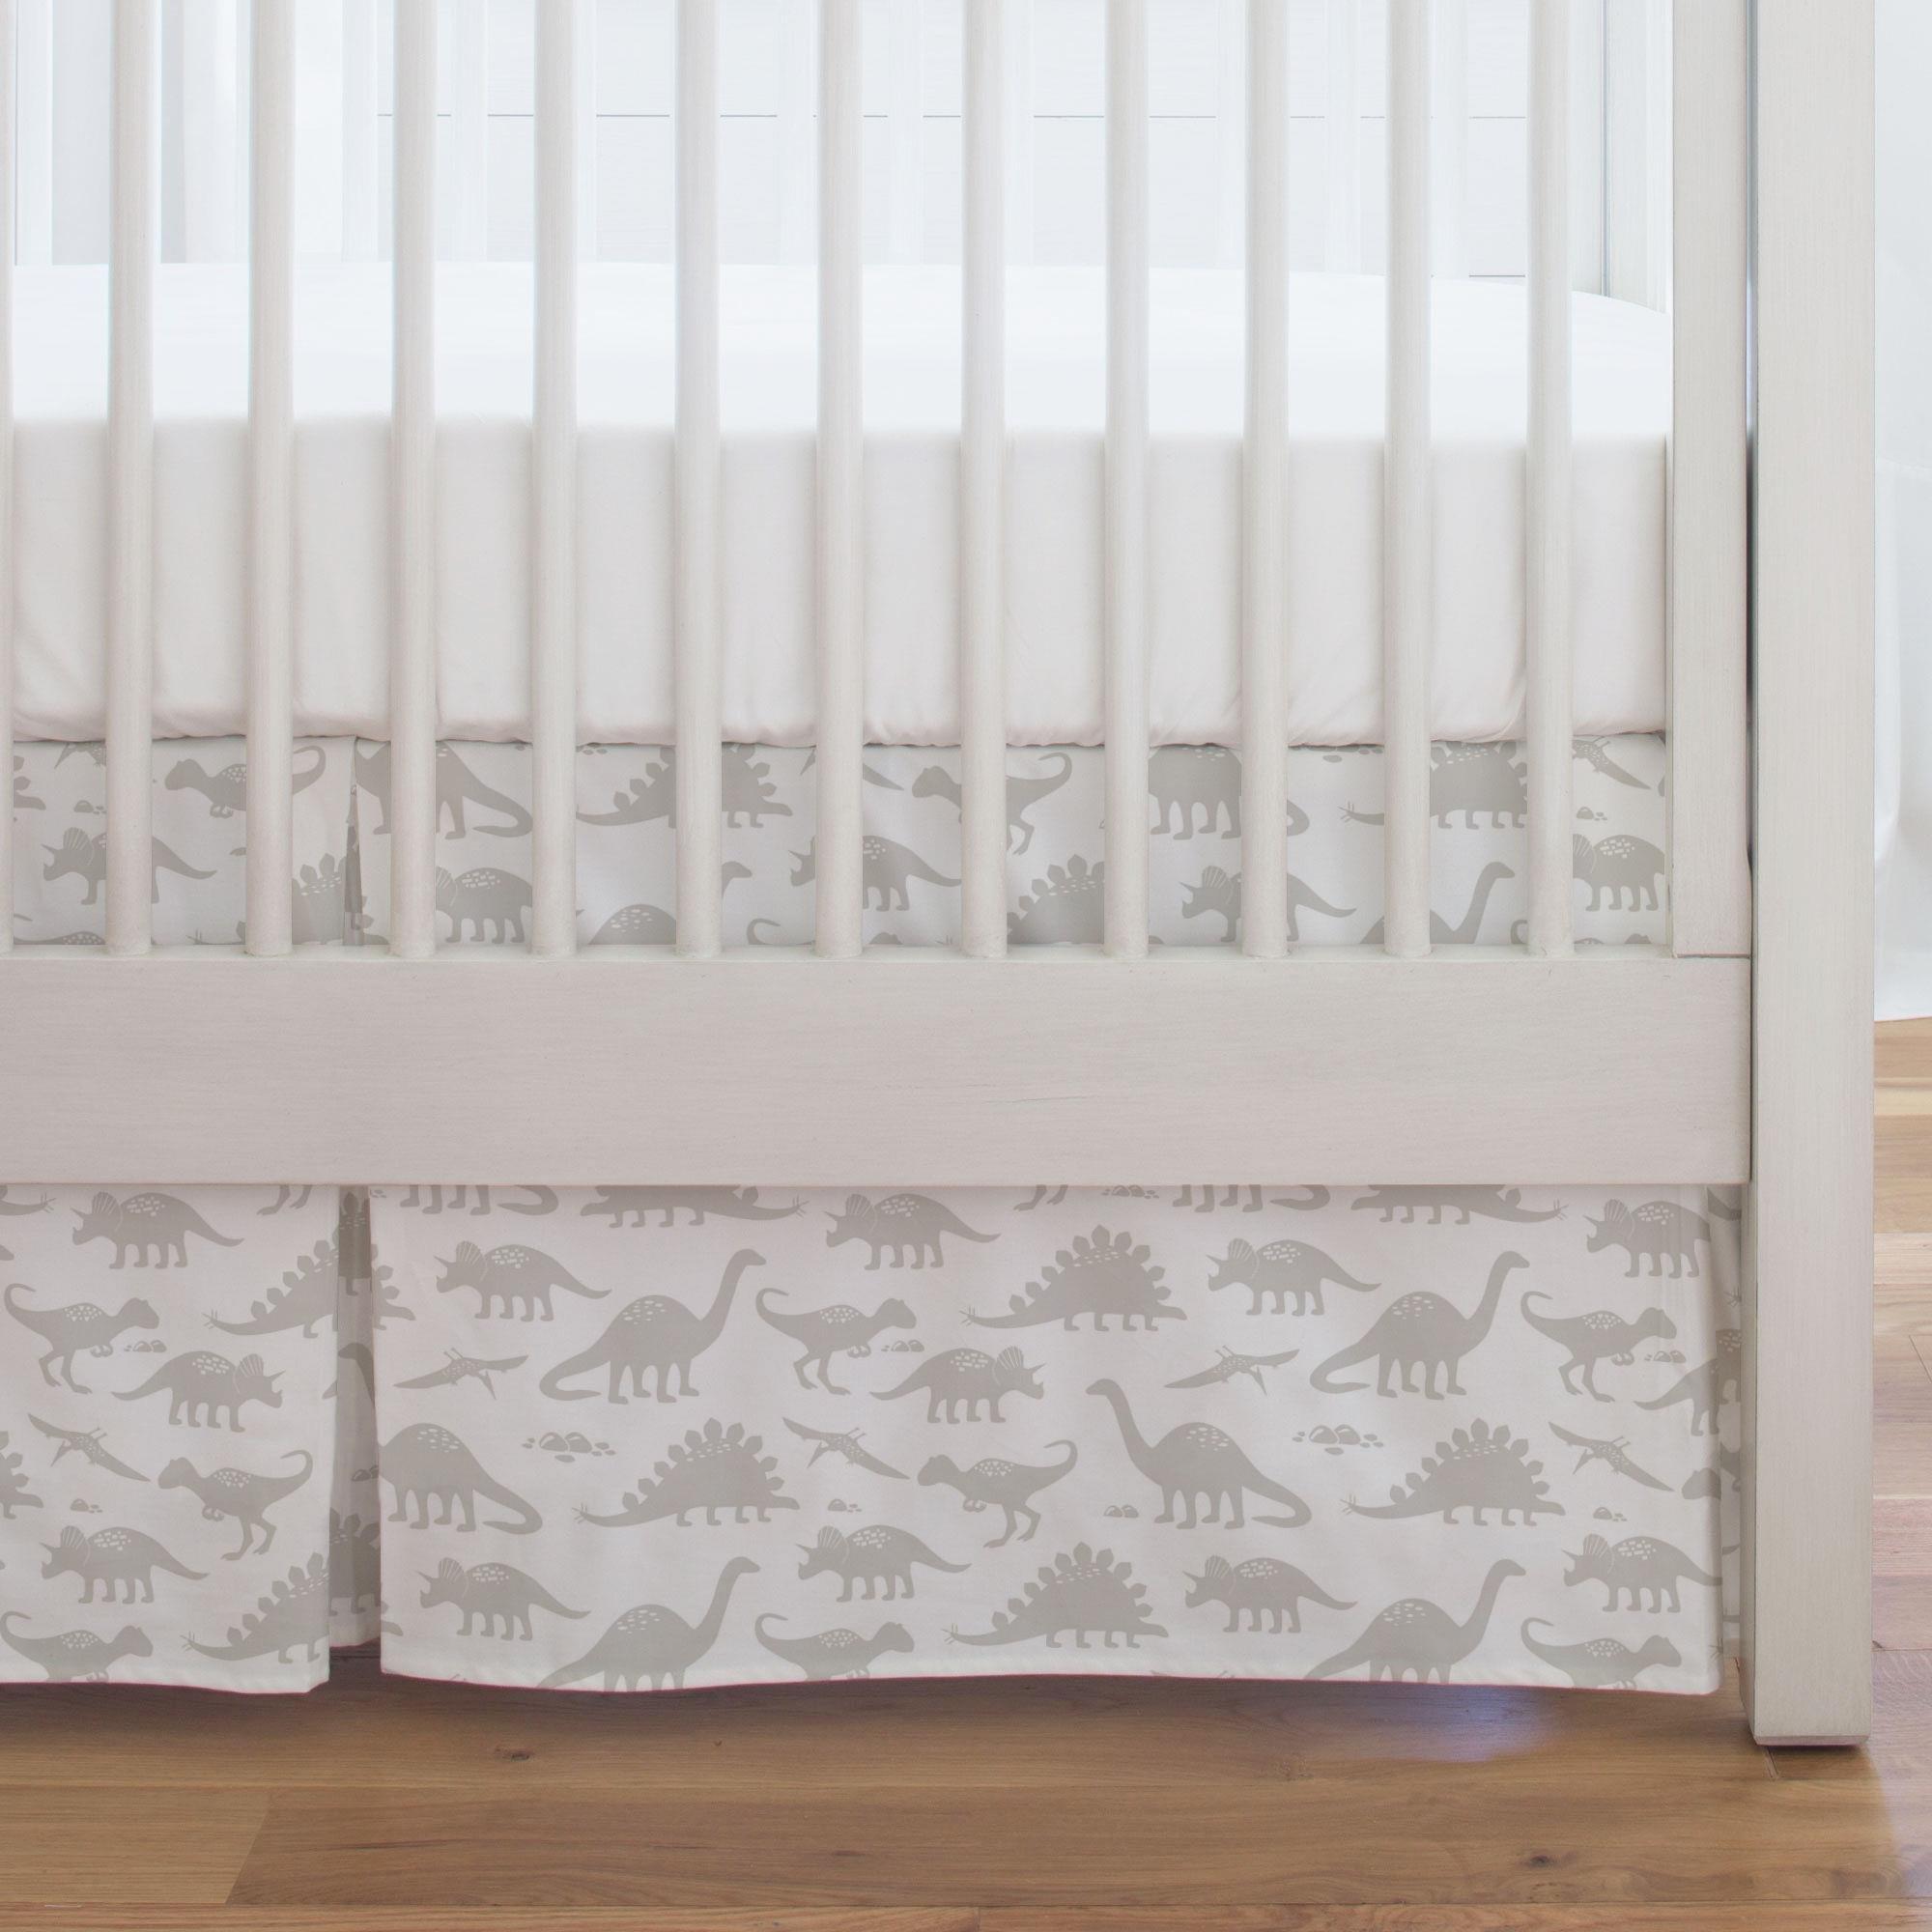 Carousel Designs French Gray Dinosaurs Crib Skirt Single-Pleat 17-Inch Length - Organic 100% Cotton Crib Skirt - Made in the USA